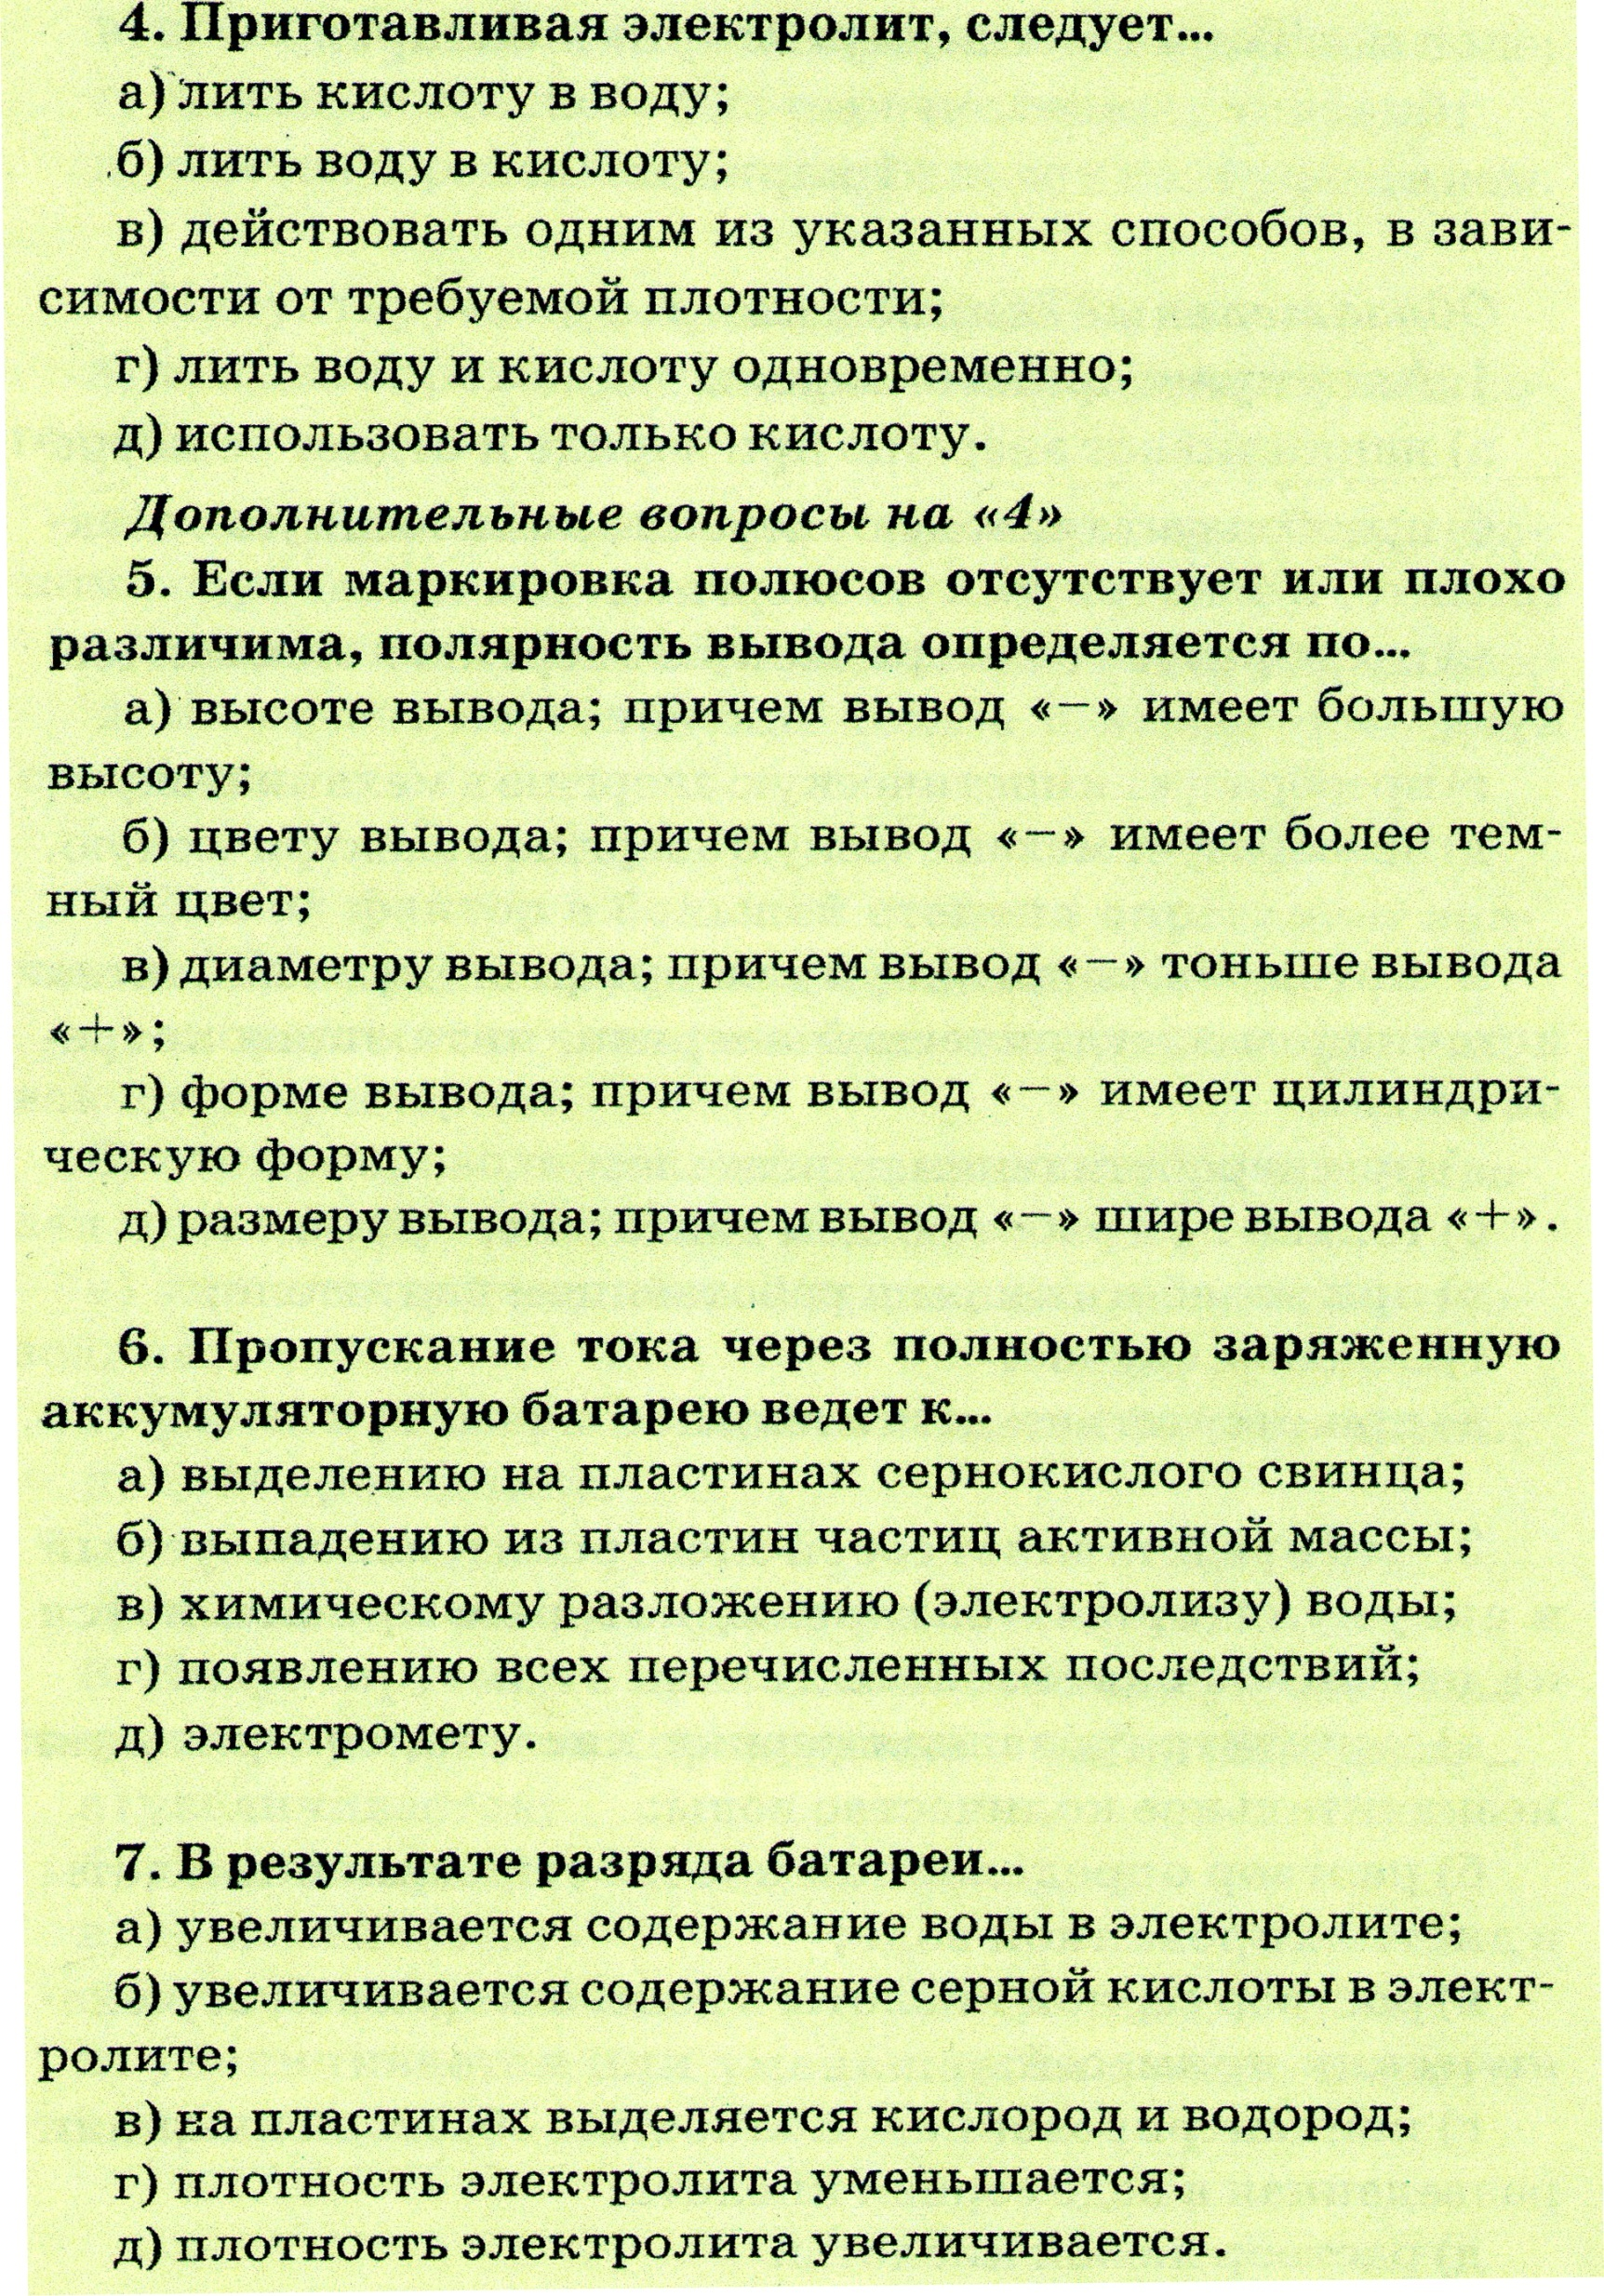 C:\Users\Василий Мельченко\Pictures\img542.jpg